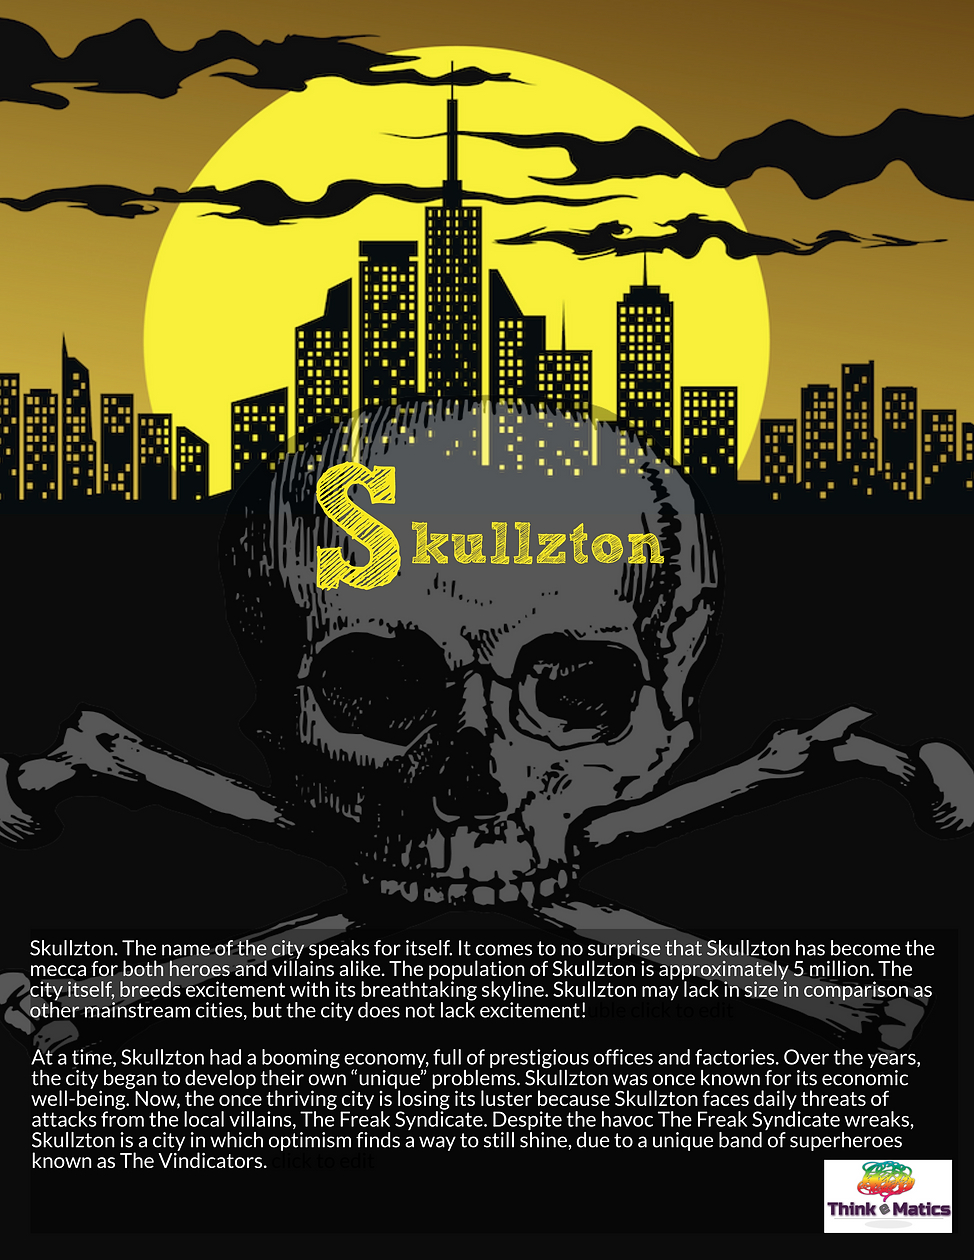 skullzton_34202510-2.png